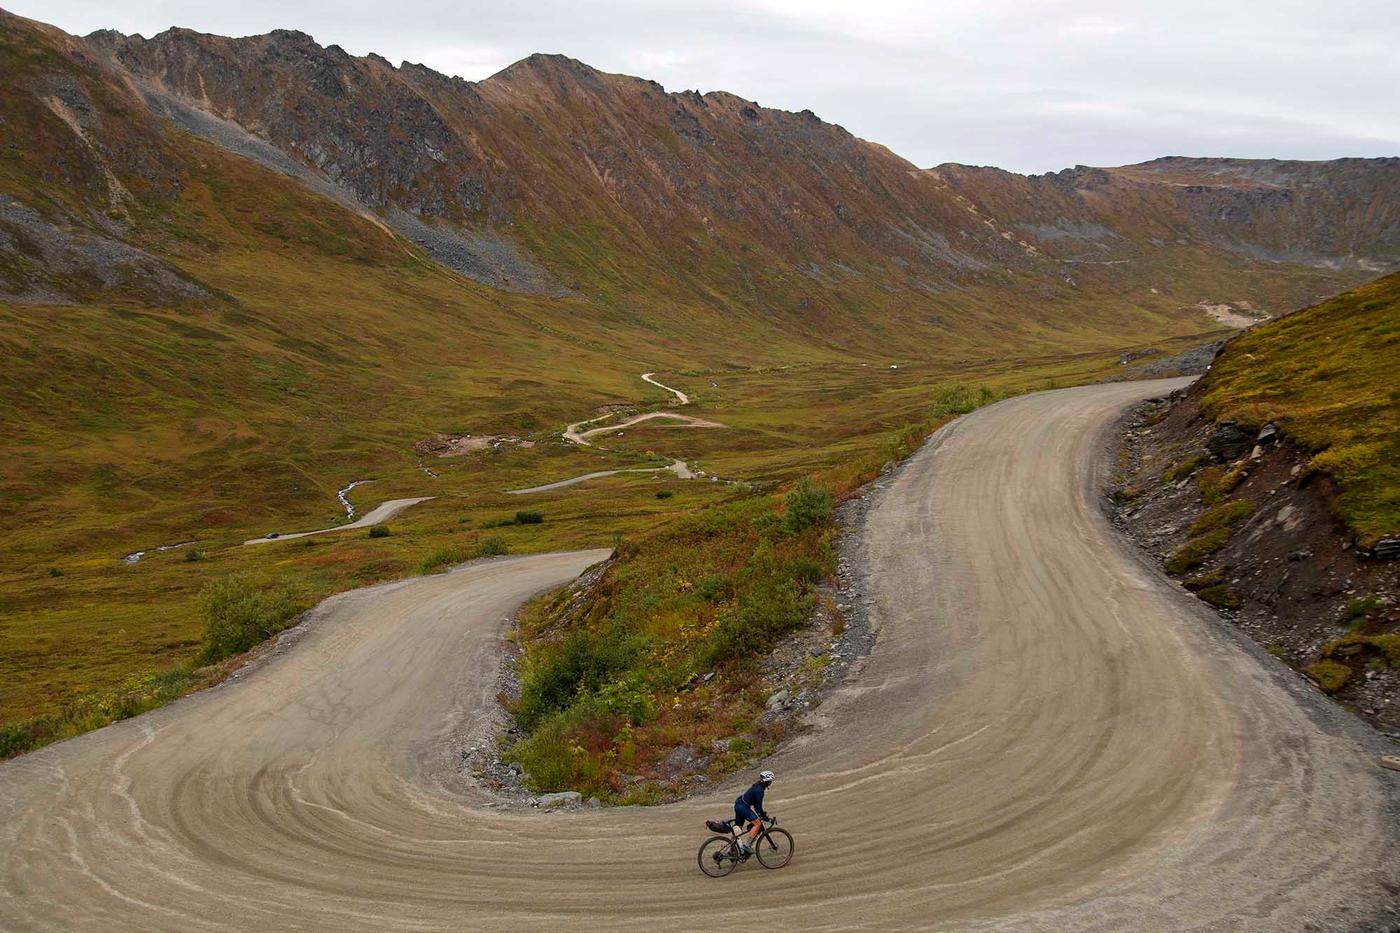 Lael Rides Alaska